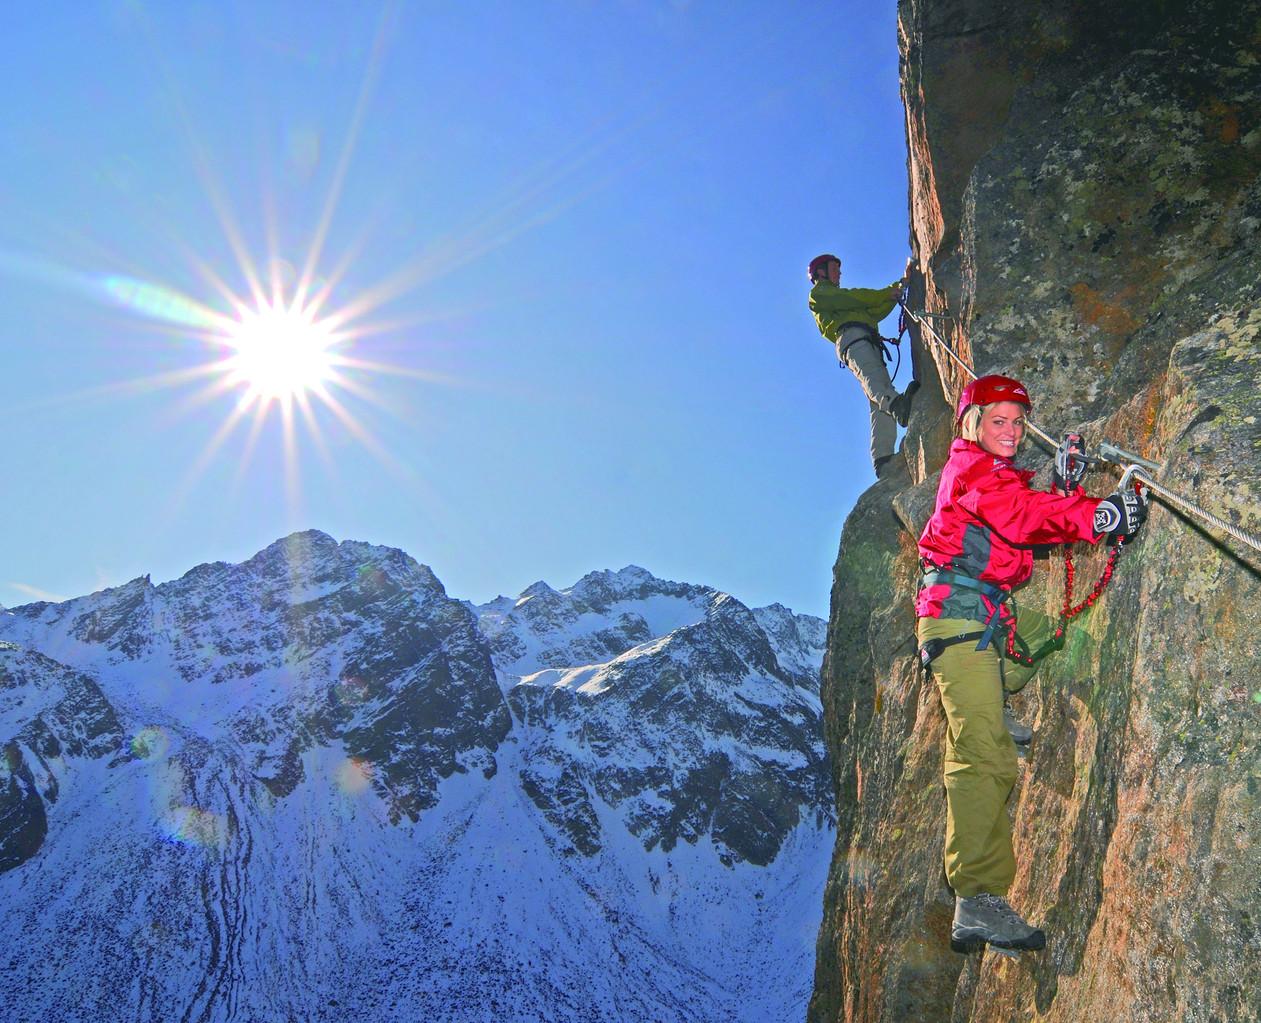 Kletterparadies - Bildarchiv TVB Stubai